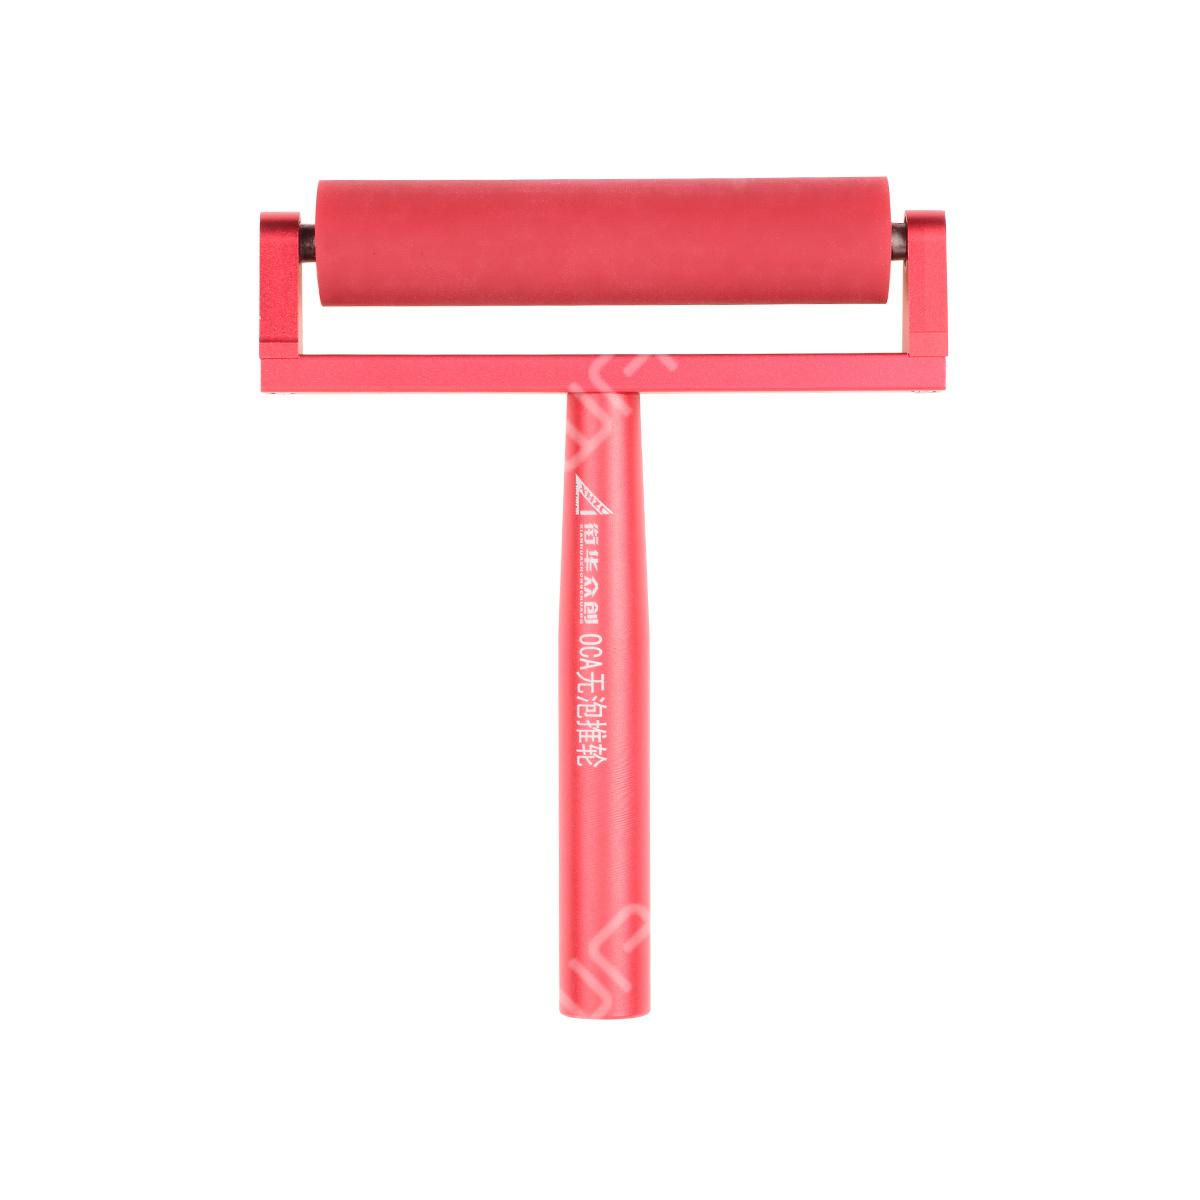 10cm Roller Tool for Laminating Polarizer & OCA - OEM New